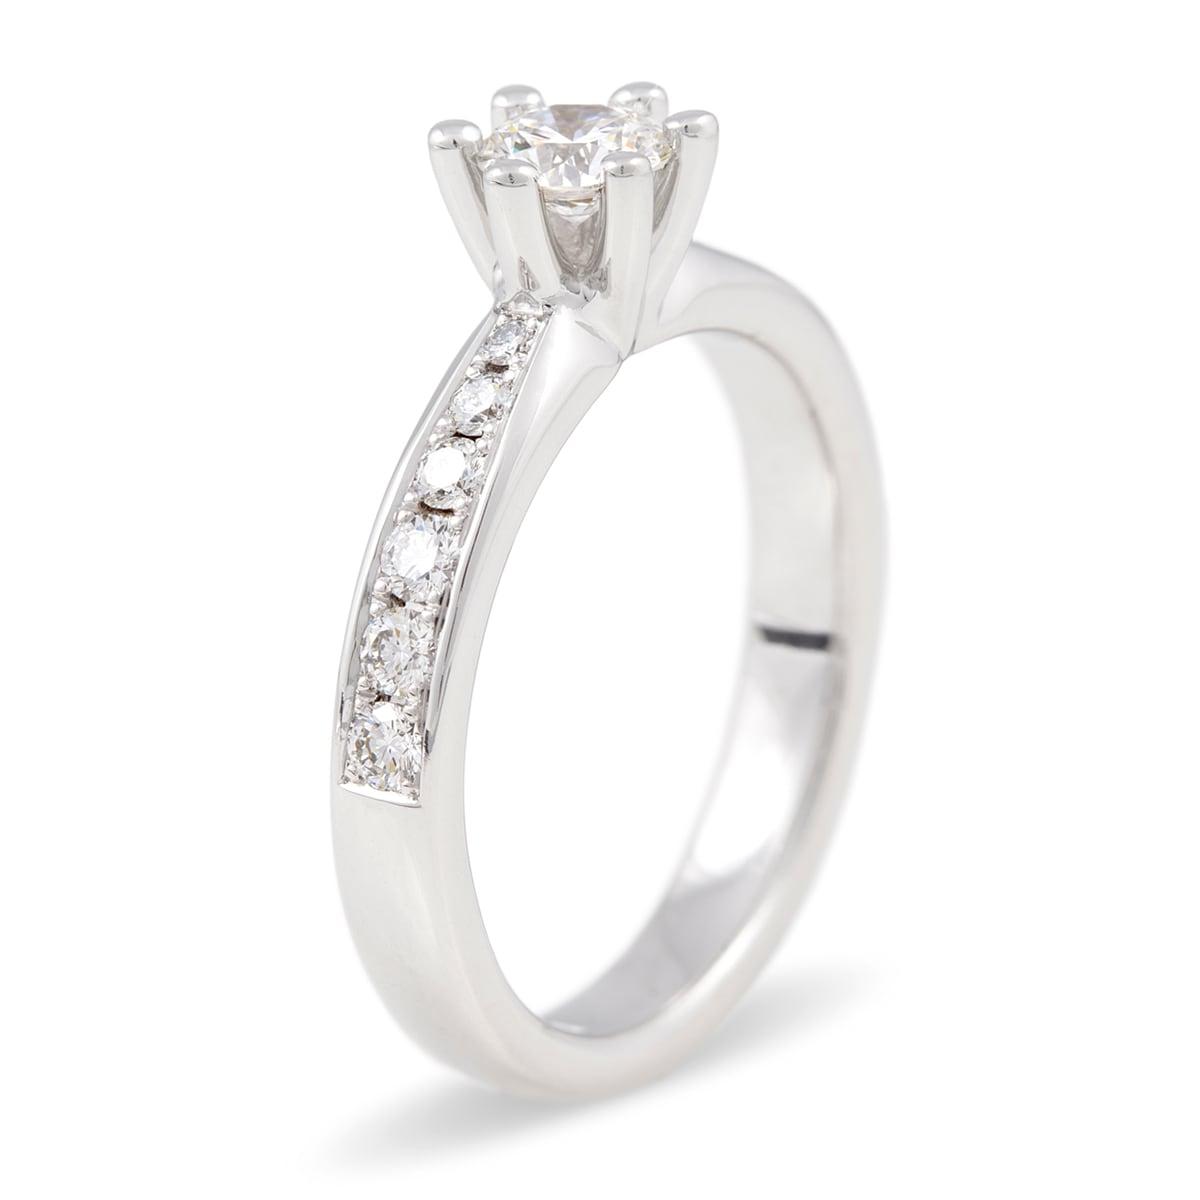 Sandin 1956 Diamantring Vigselring Glow Jarl Sandin b703b3b7f83ef